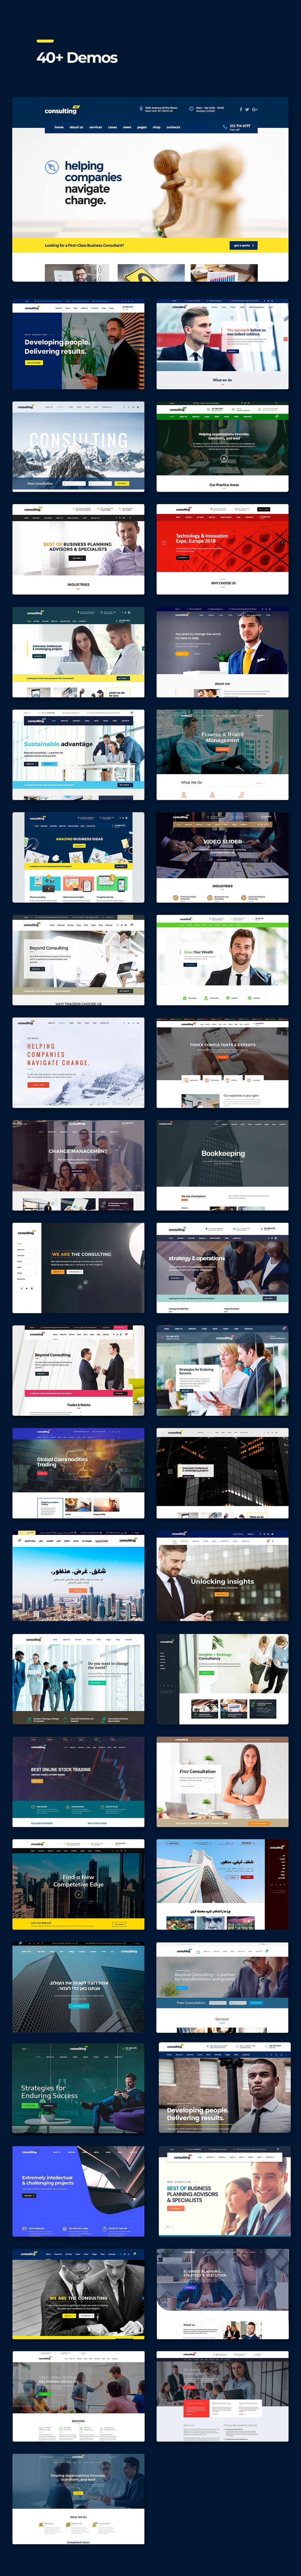 promo 1 - Consulting - Business, Finance WordPress Theme